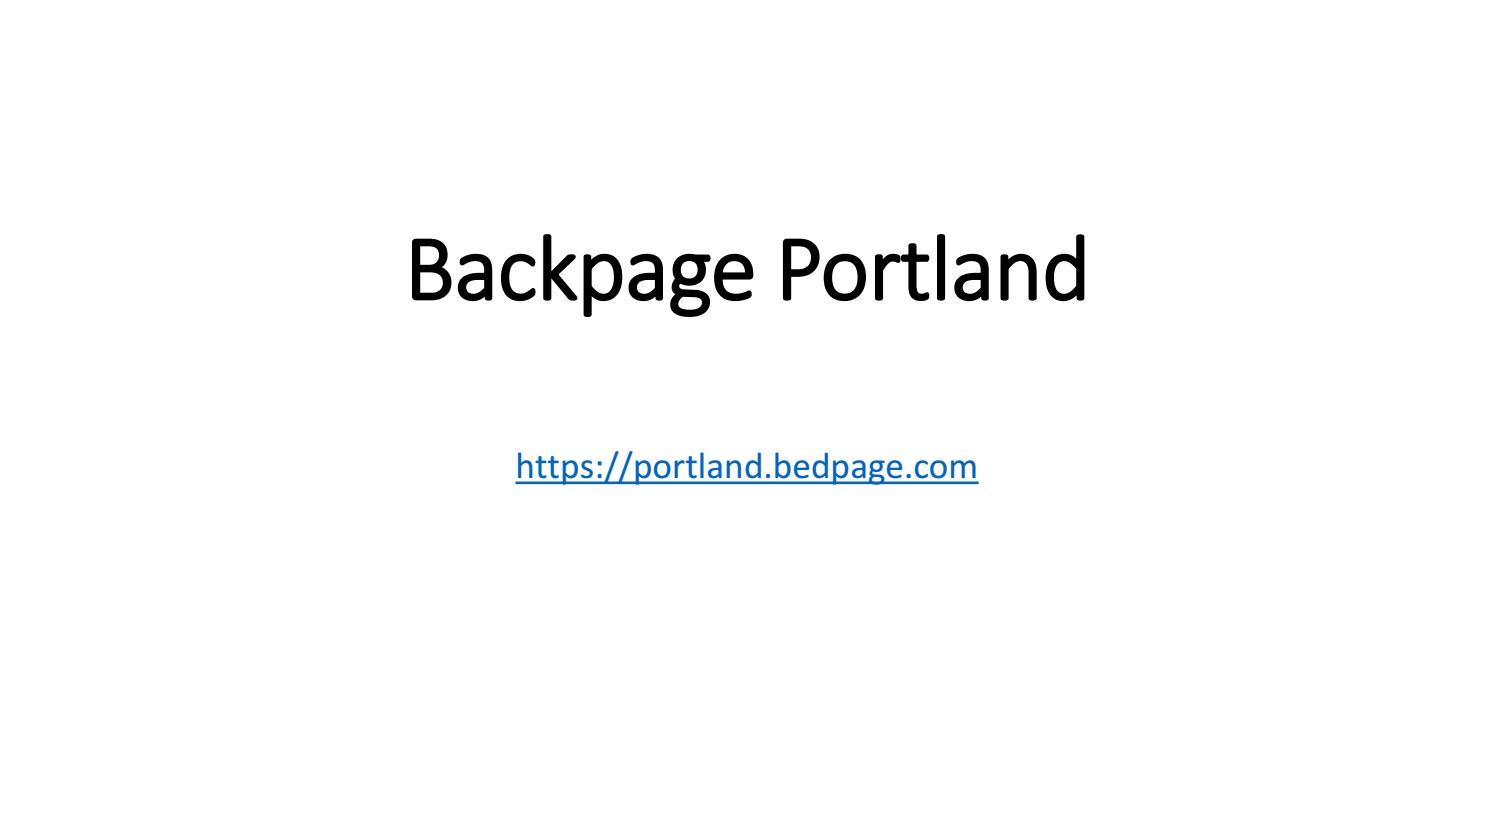 Www backpage com portland